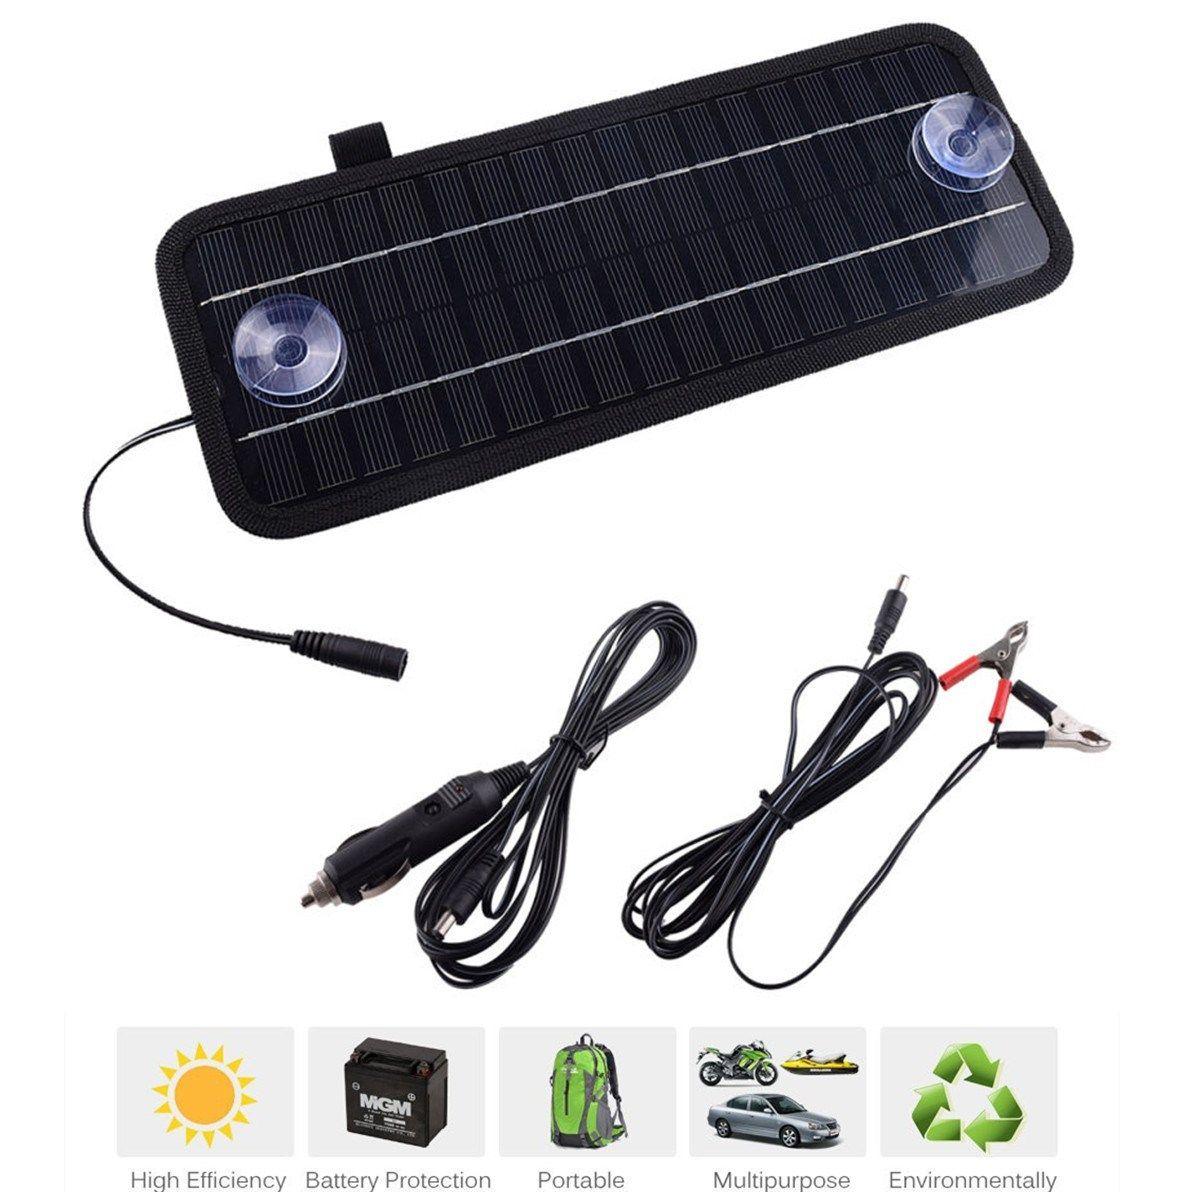 Hoge kwaliteit 12 v 4.5 w monokristallijn zonnepaneel module systeem auto automobiel boot portable oplaadbare power acculader